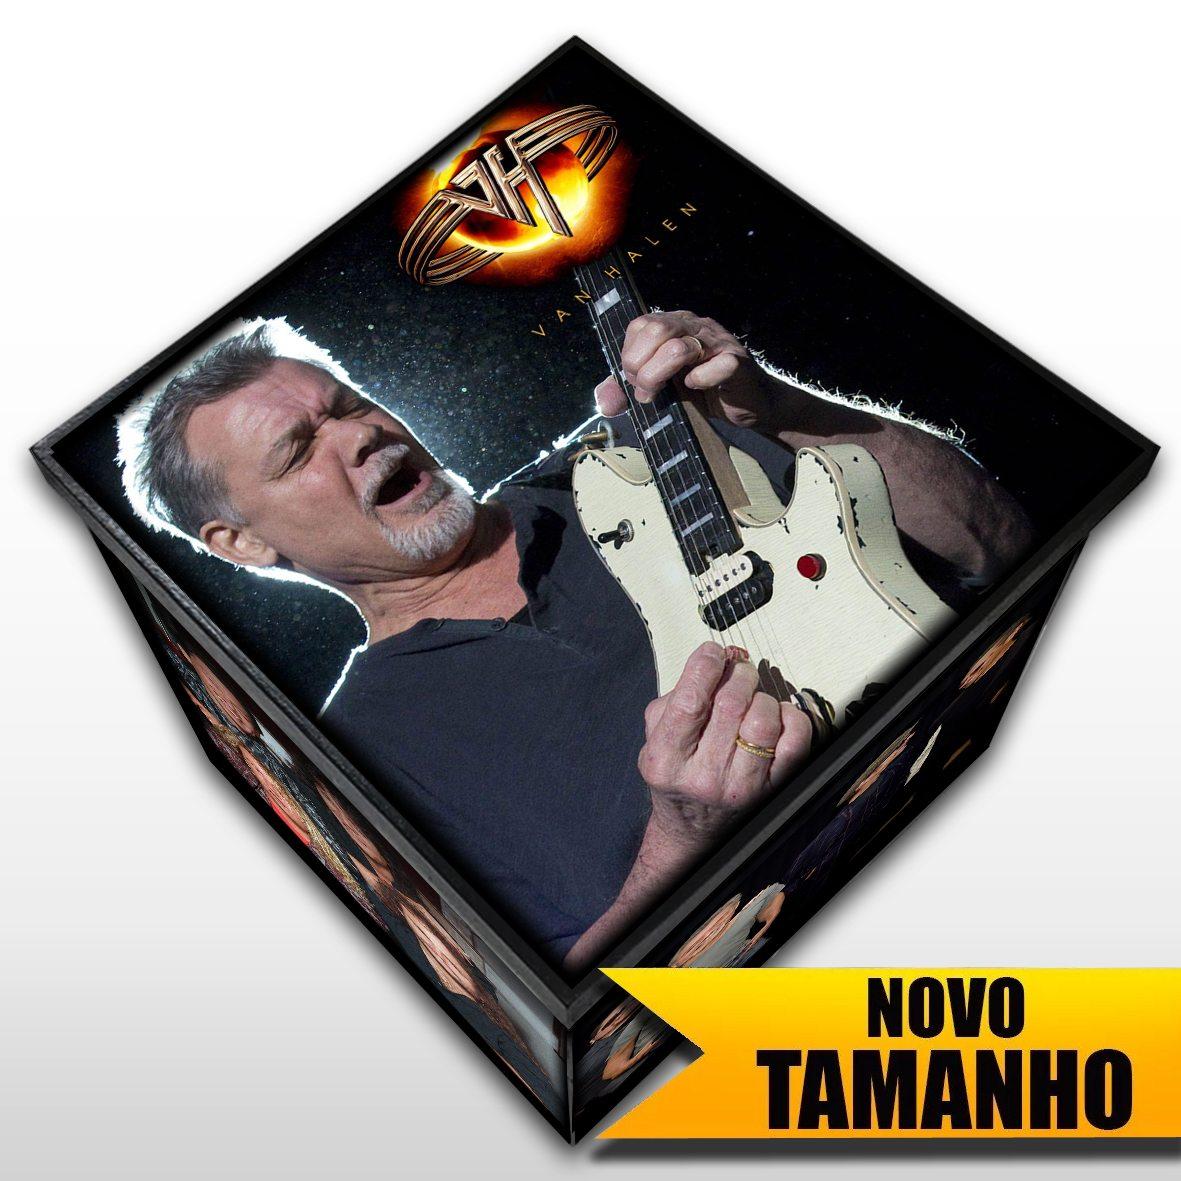 Van Halen - Caixa em MDF - Tamanho Grande - Mr. Rock